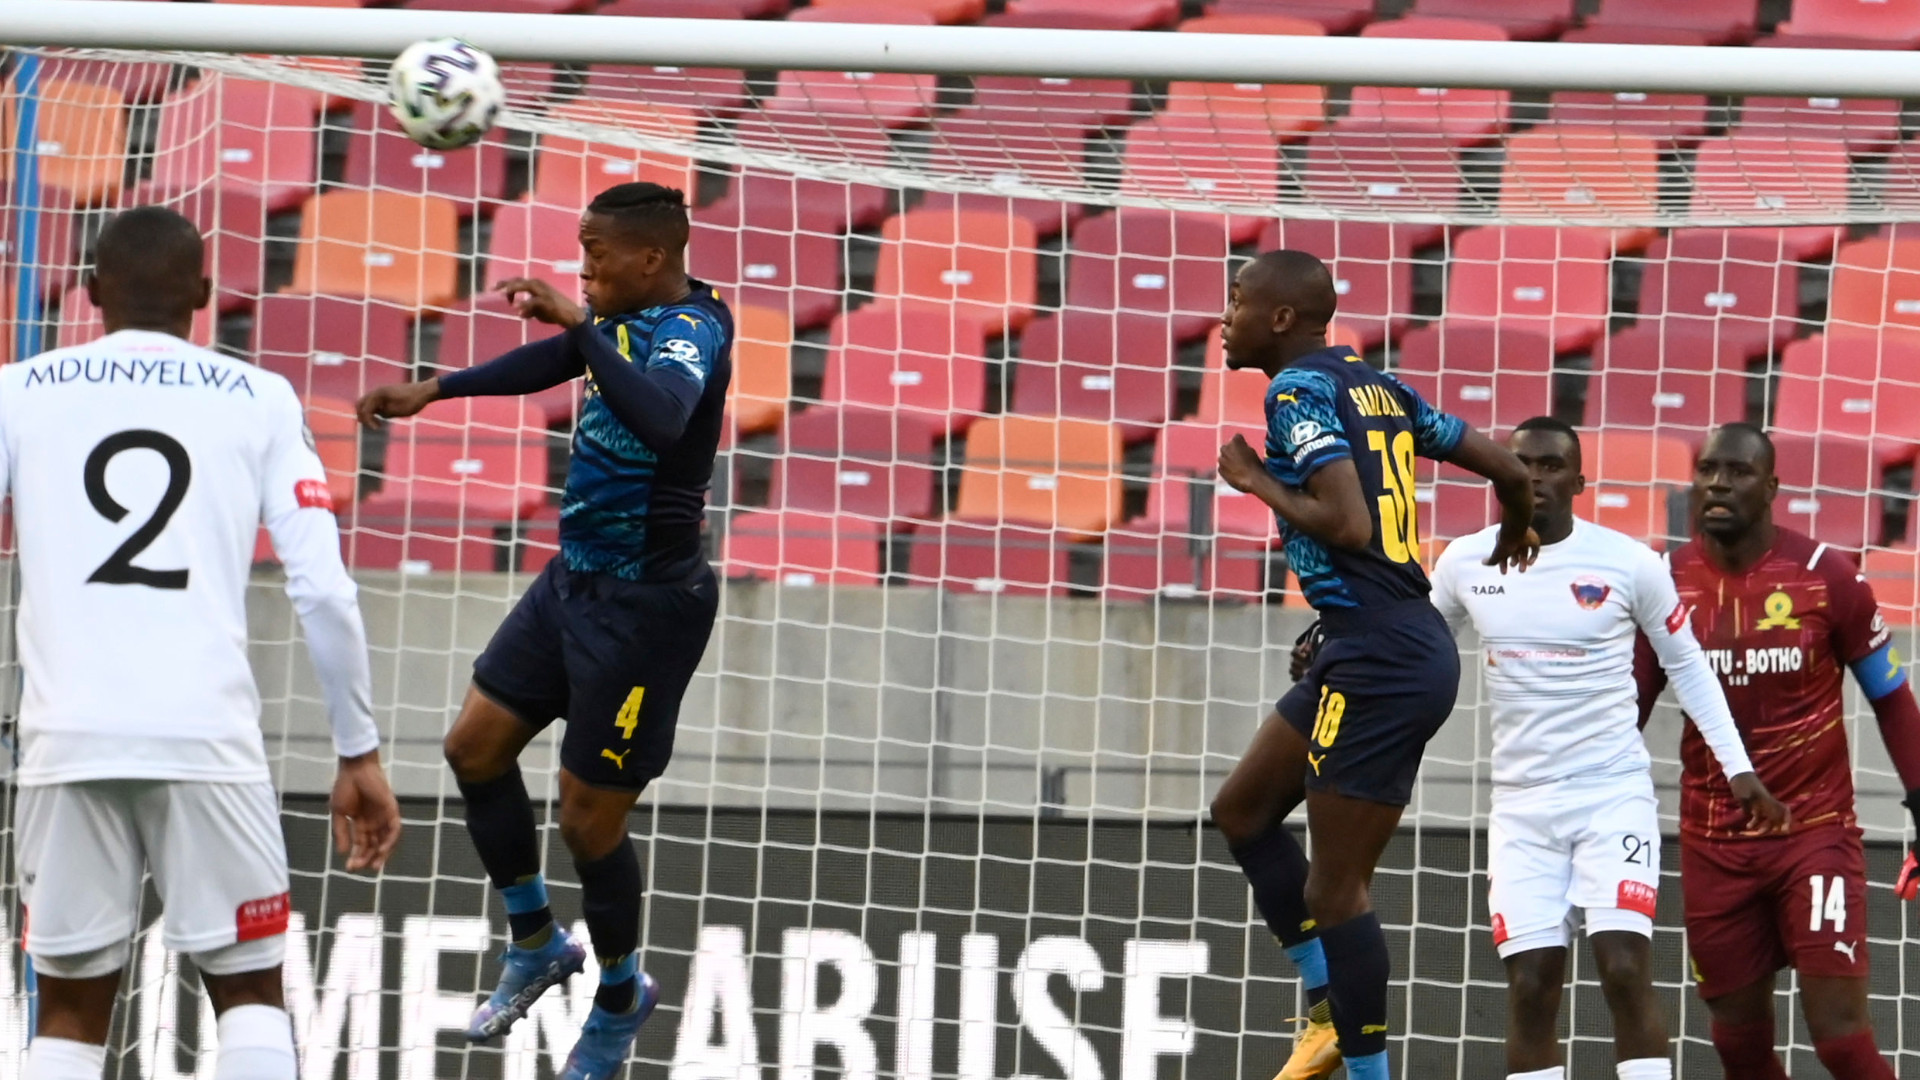 Revealed: Mamelodi Sundowns XI to face Maniema Union – Lebusa returns, Onyango in surprise start